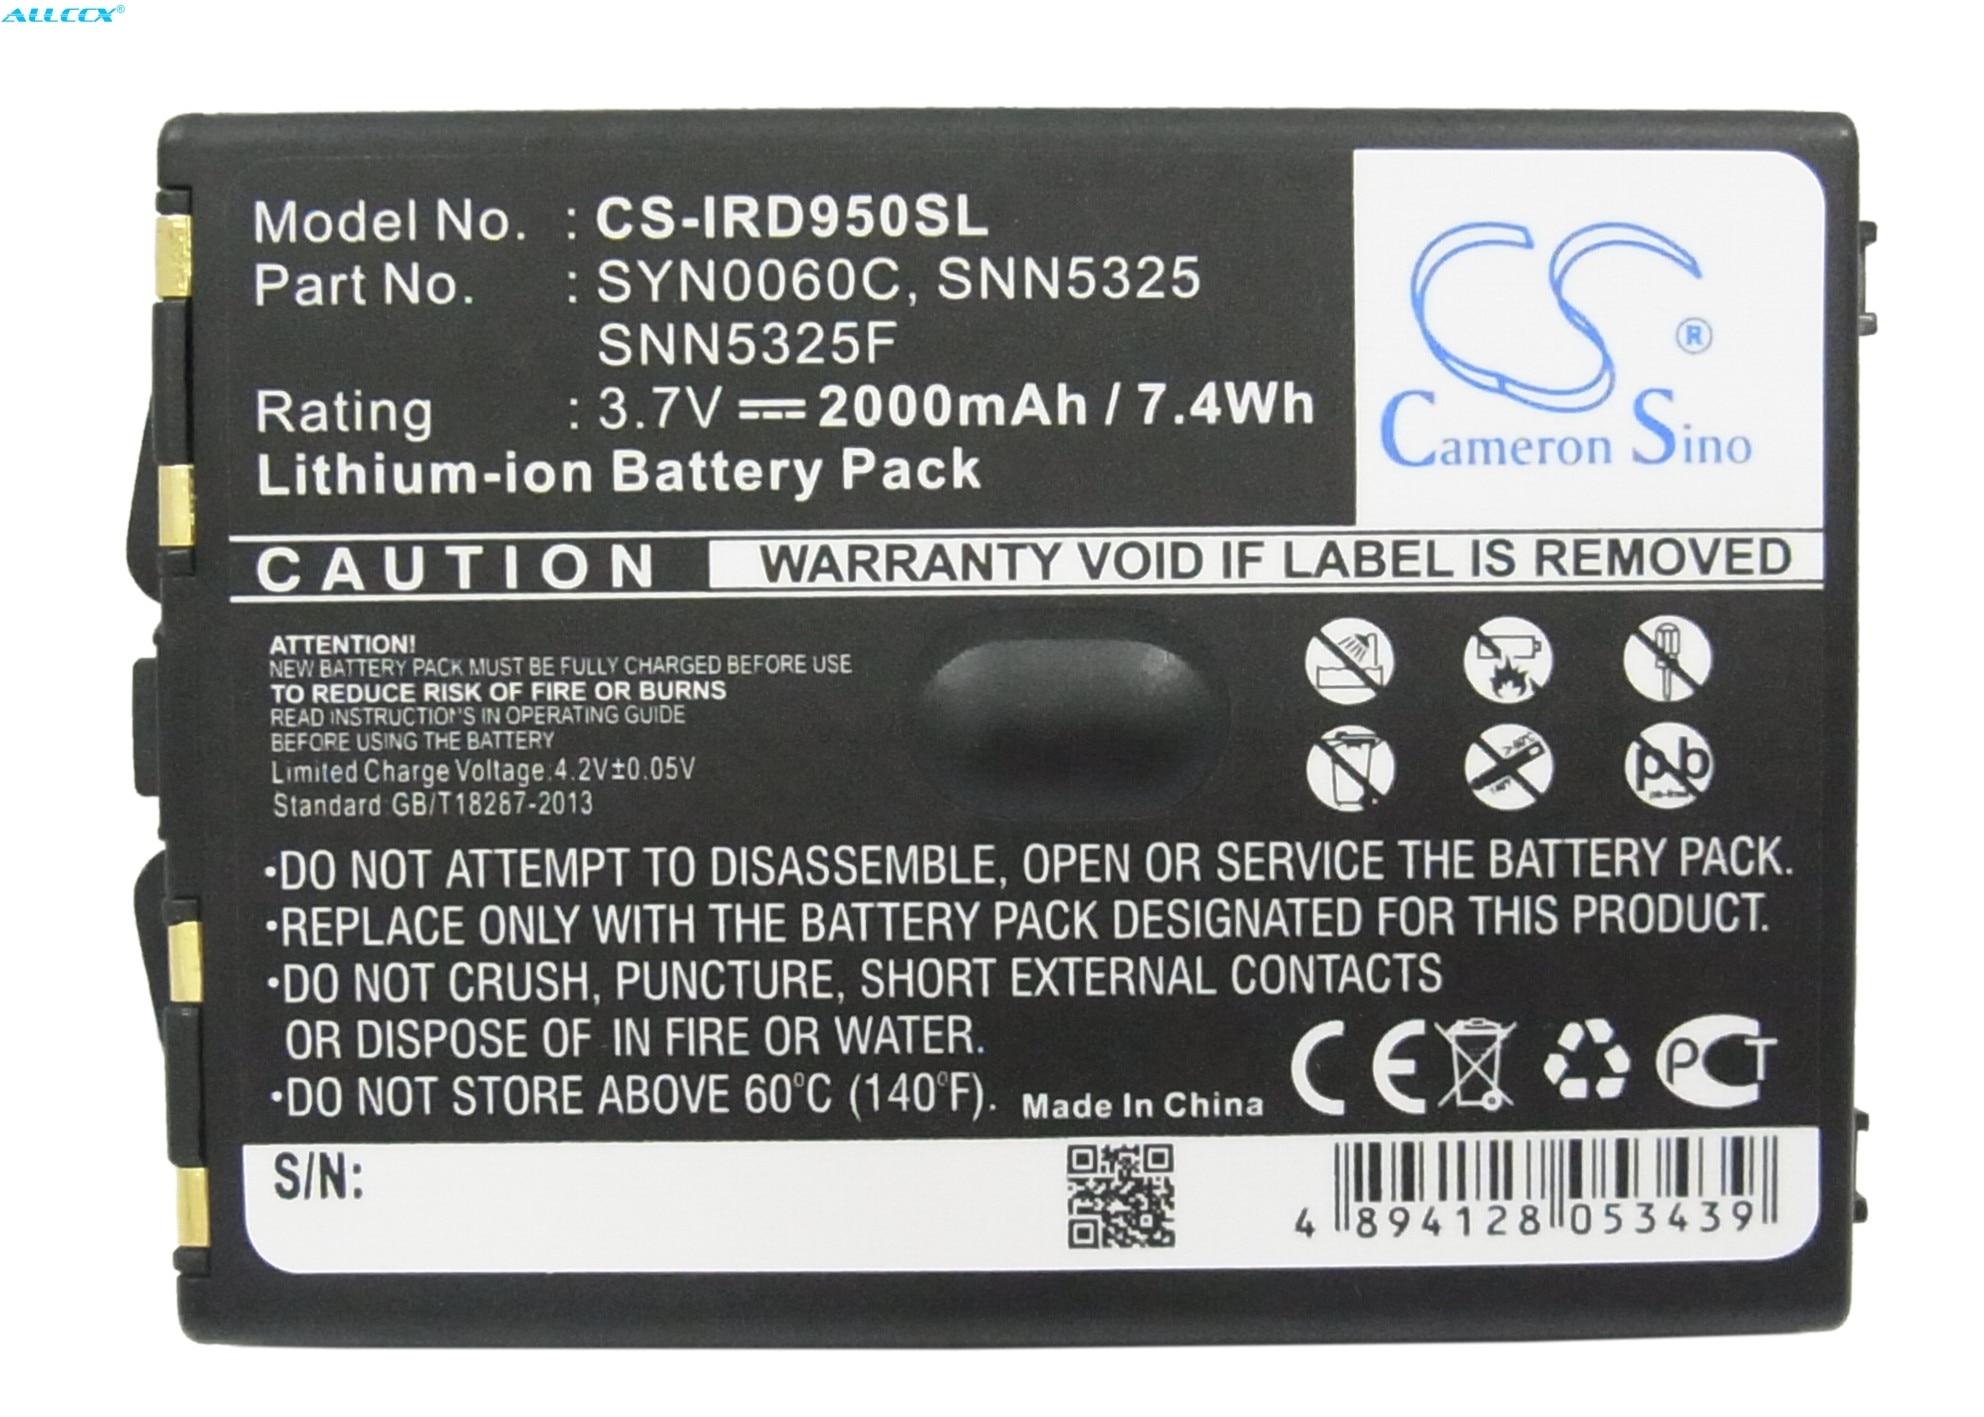 Cameron Sino 2000mAh Battery SNN5325, SNN5325F, SYN0060C for Iridium 9500, 9505(China)